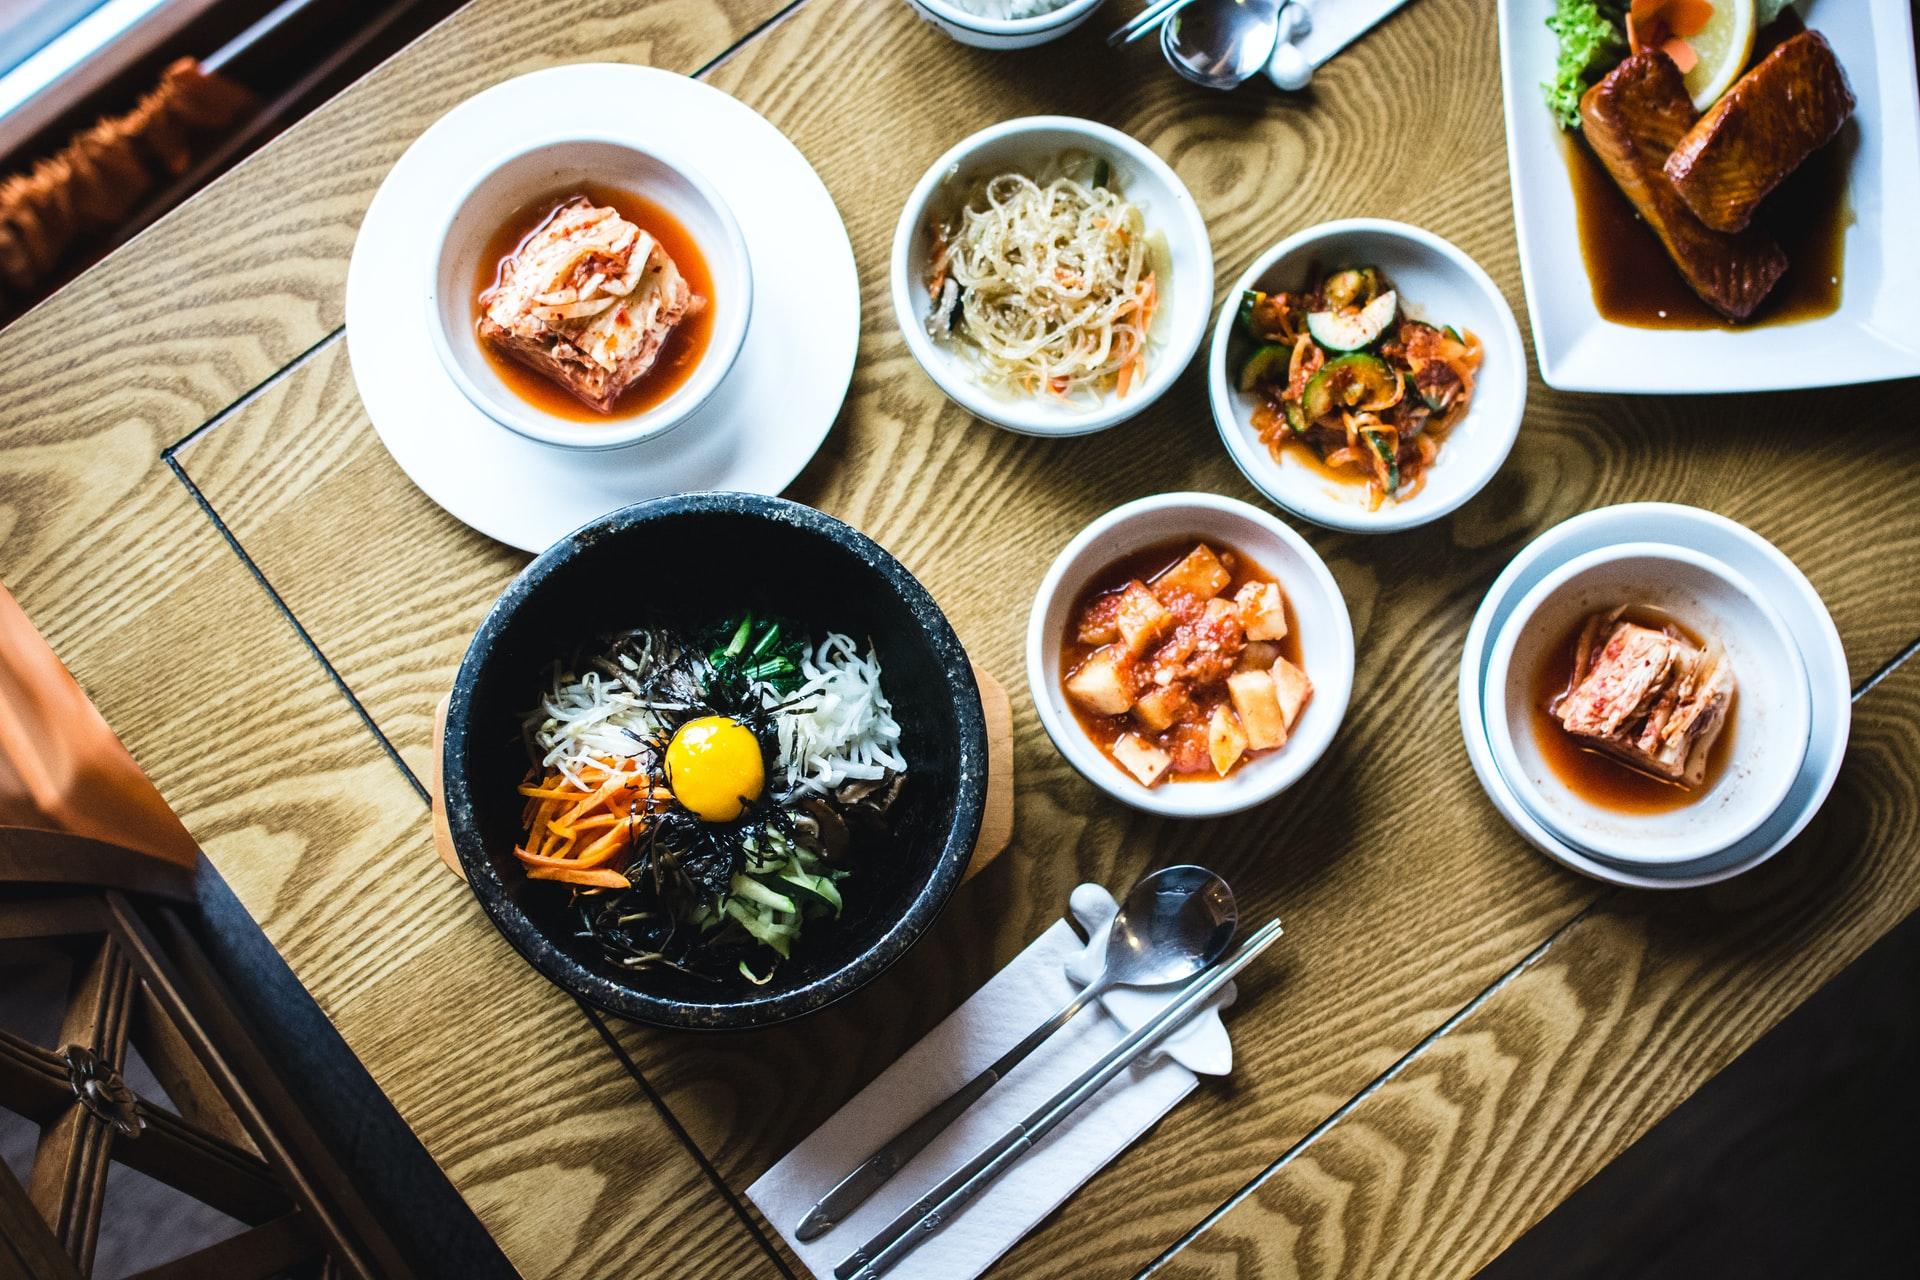 Don't Miss the Bibimbap at Moms Korean BBQ